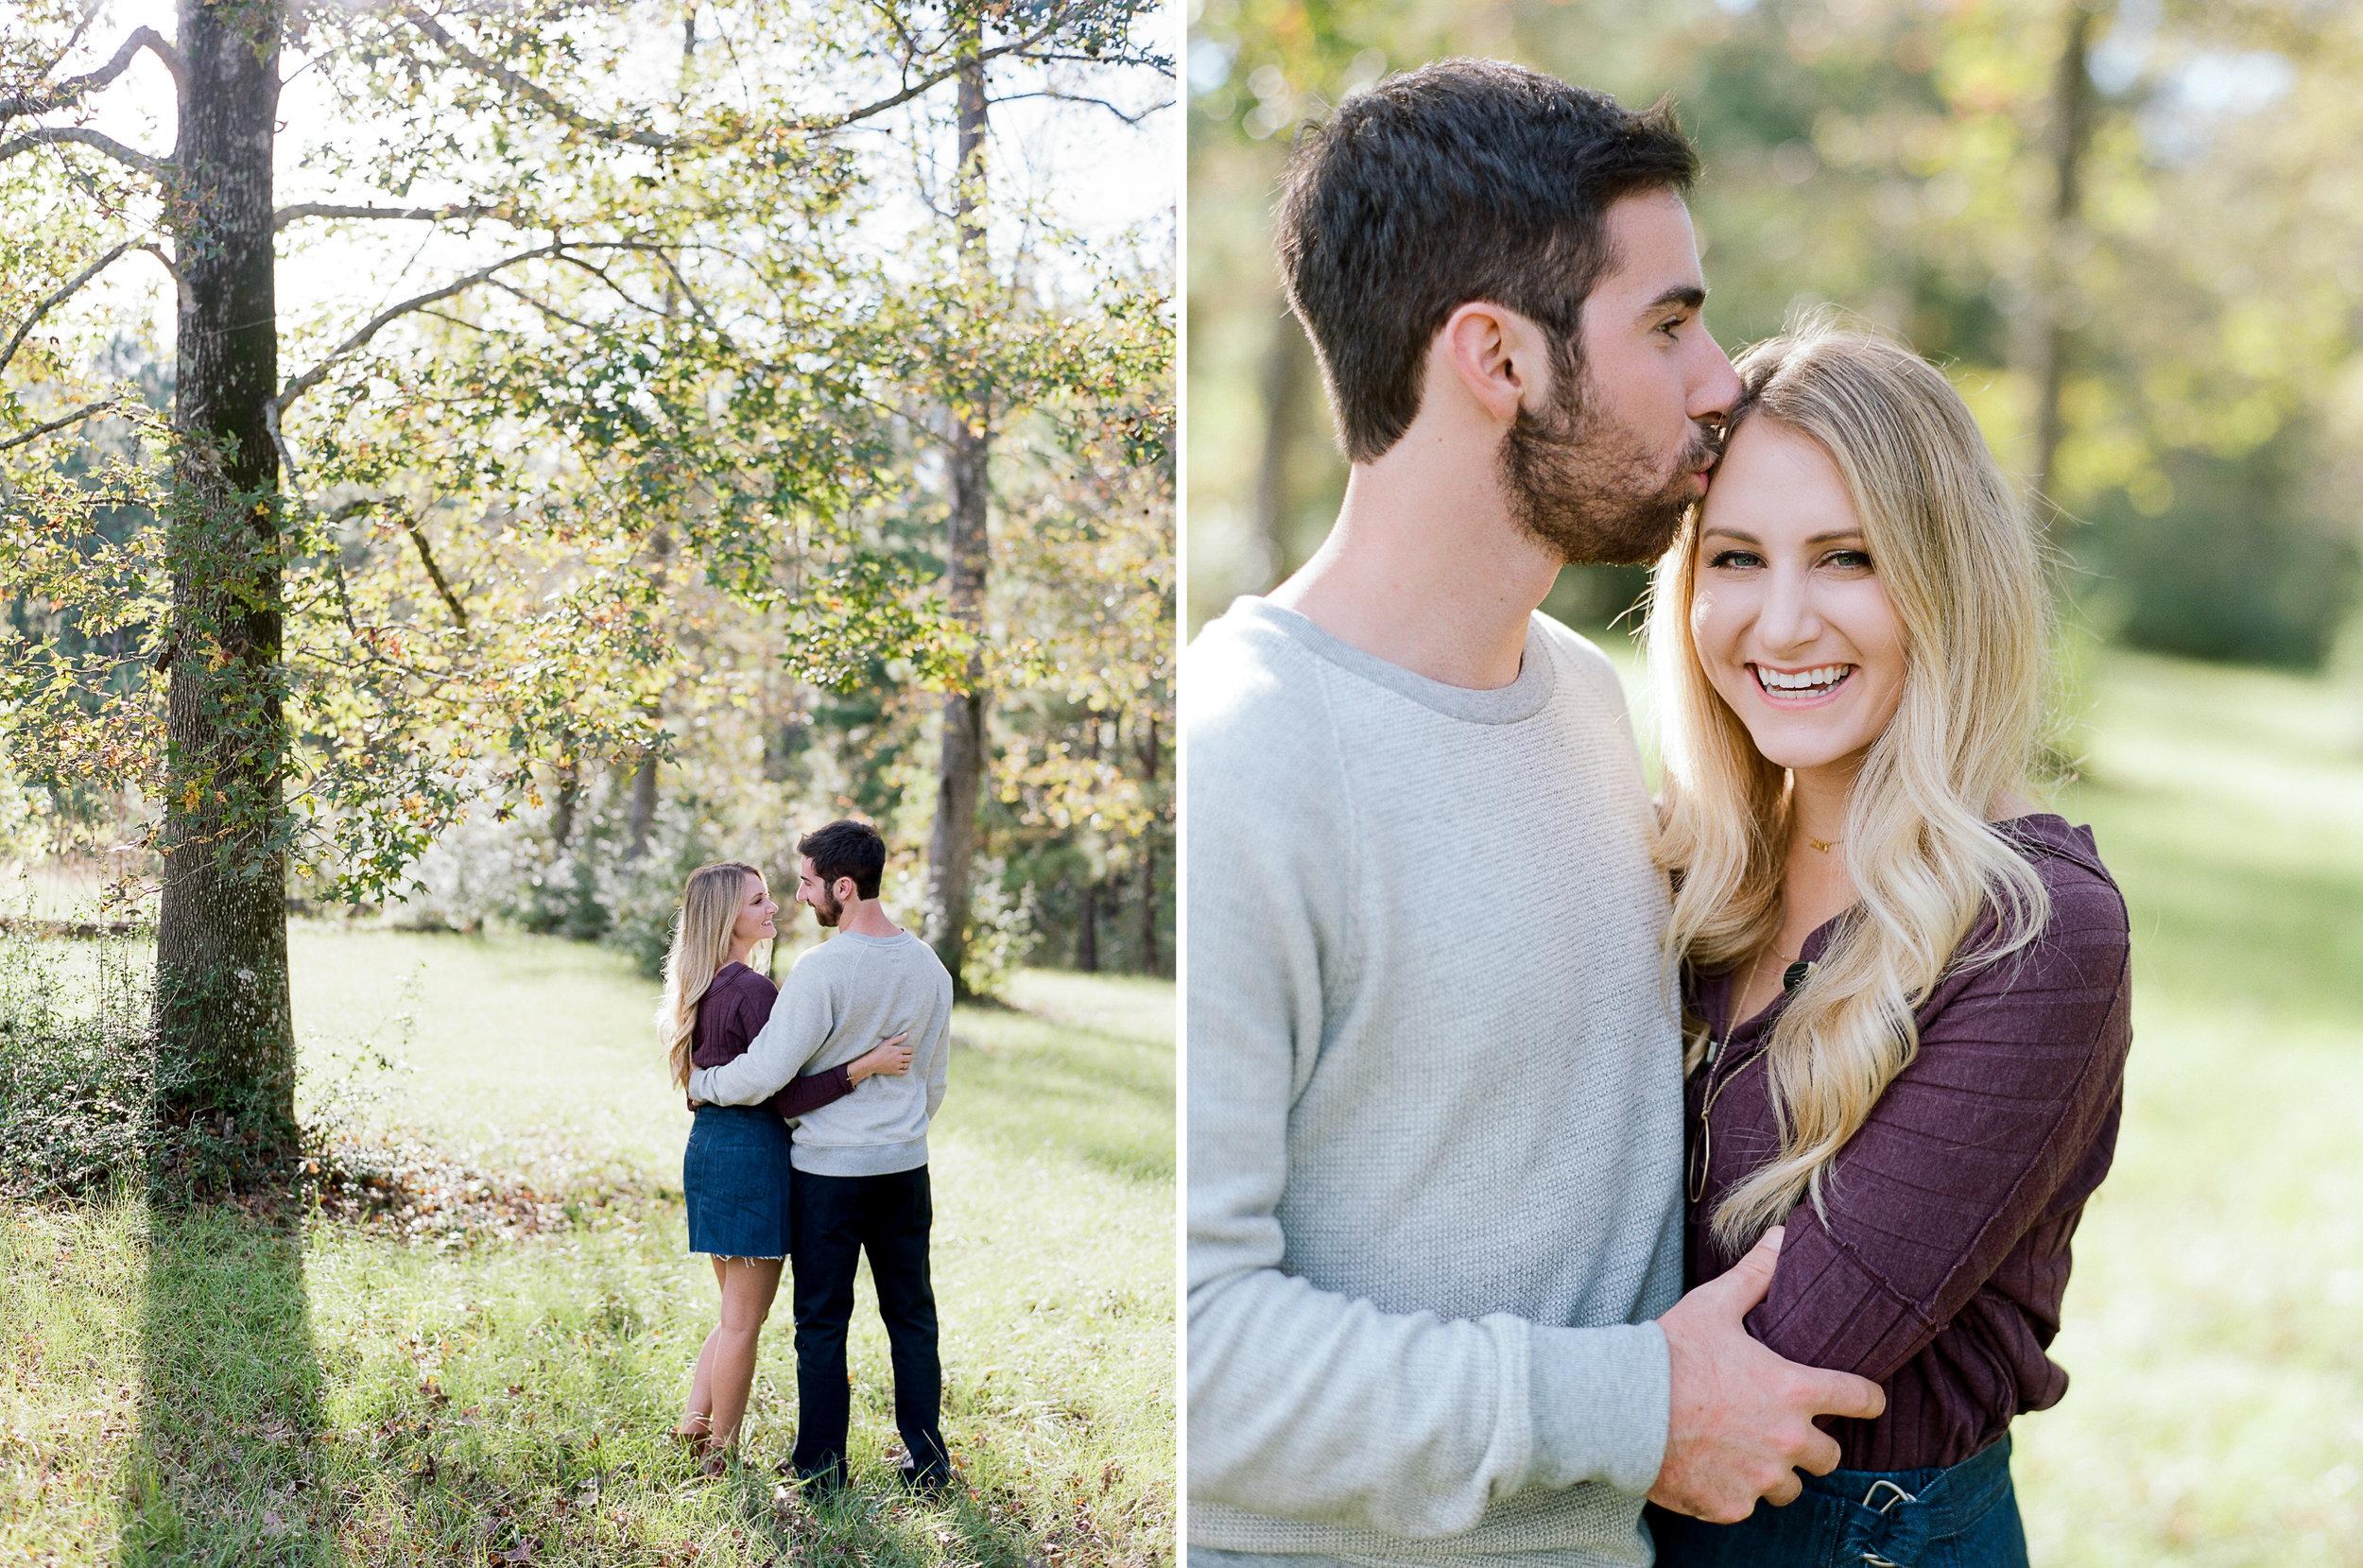 Houston-Wedding-Photographer-Best-Top-Luxury-Destination-Engagements-Portrait-Austin-Photography-101.jpg